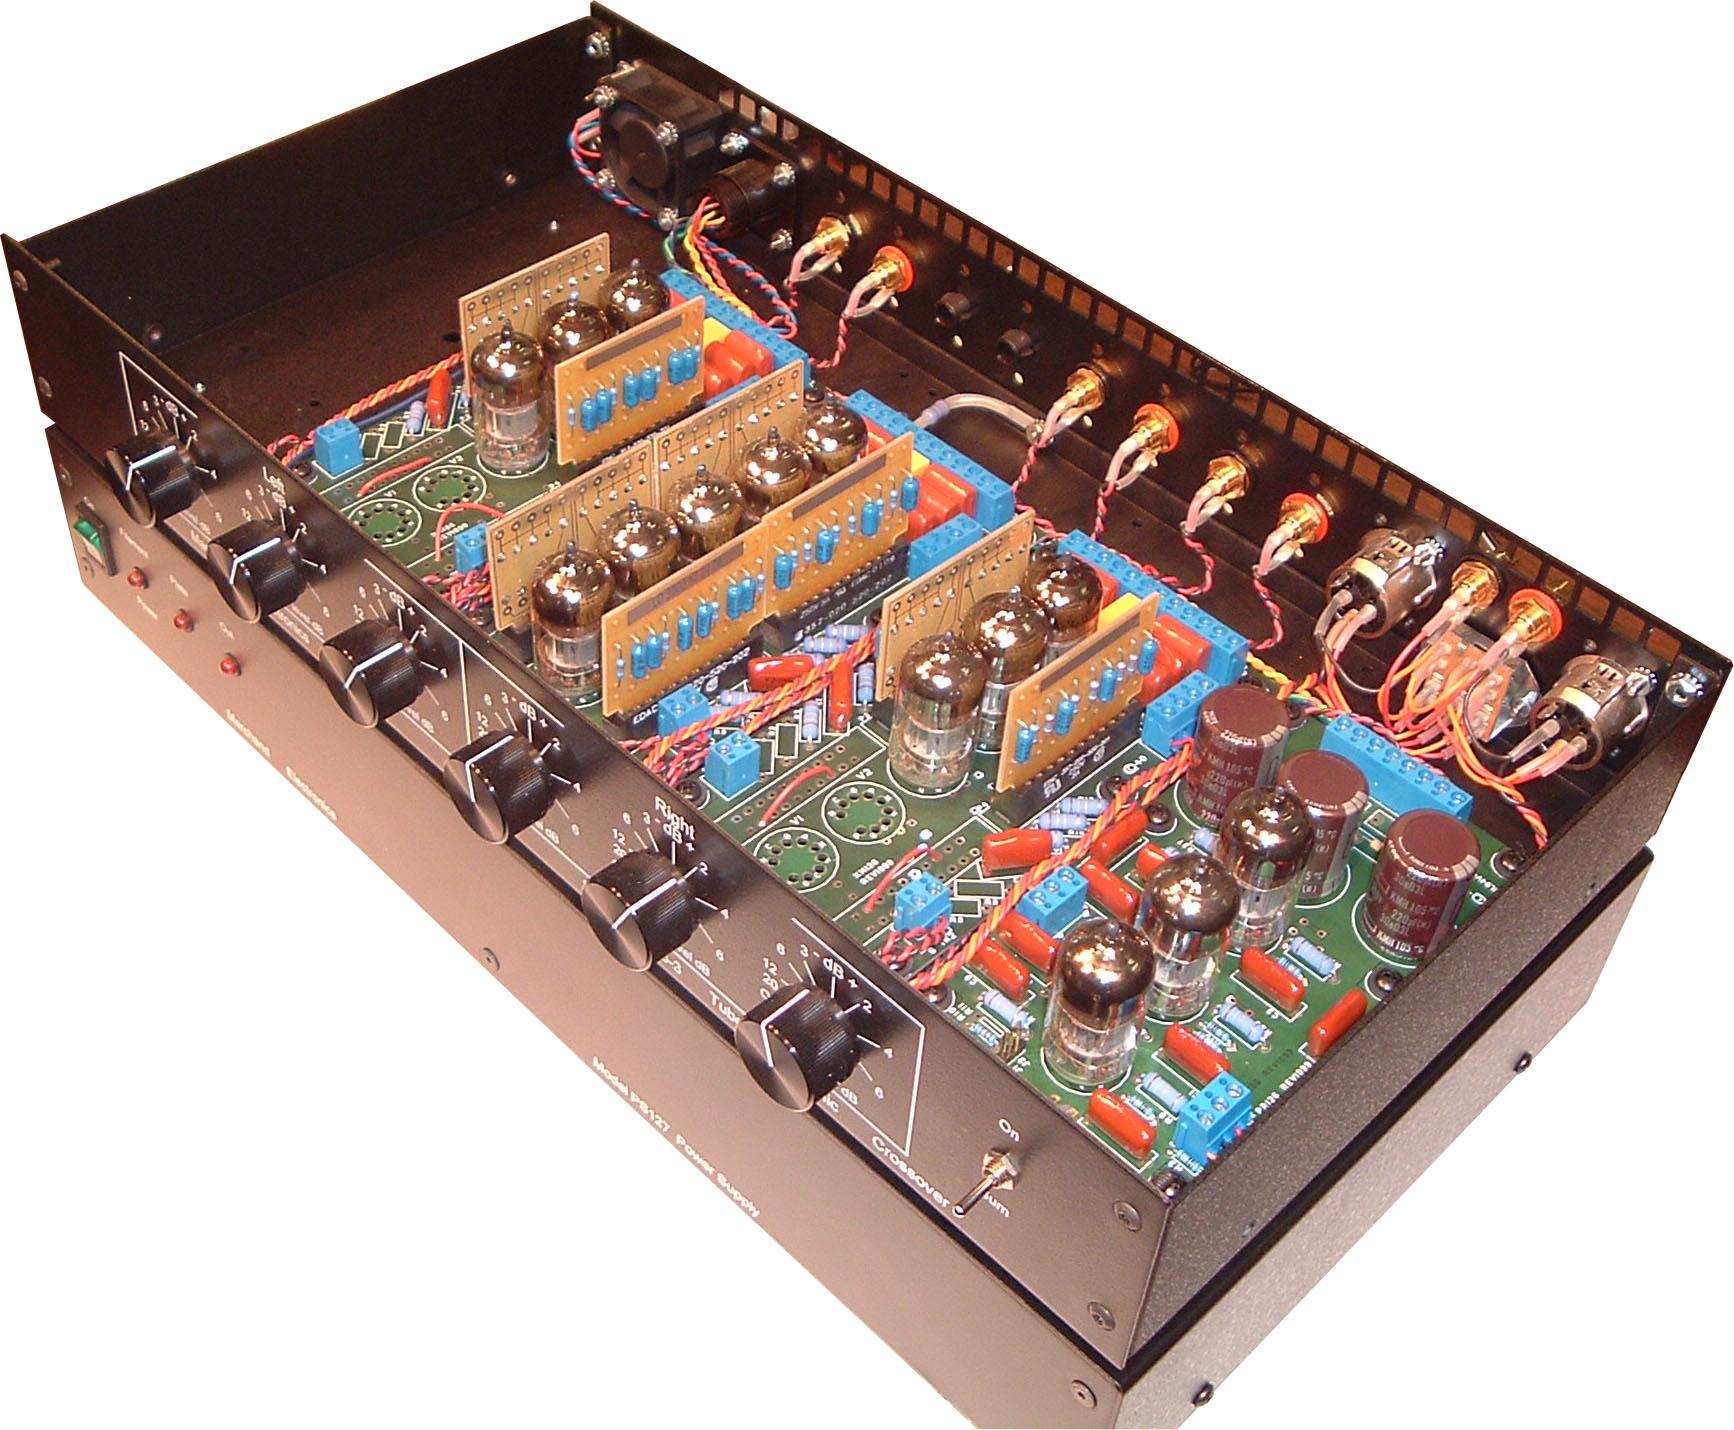 Electronic Crossover Network : Xm vacuum tube electronic crossover network way